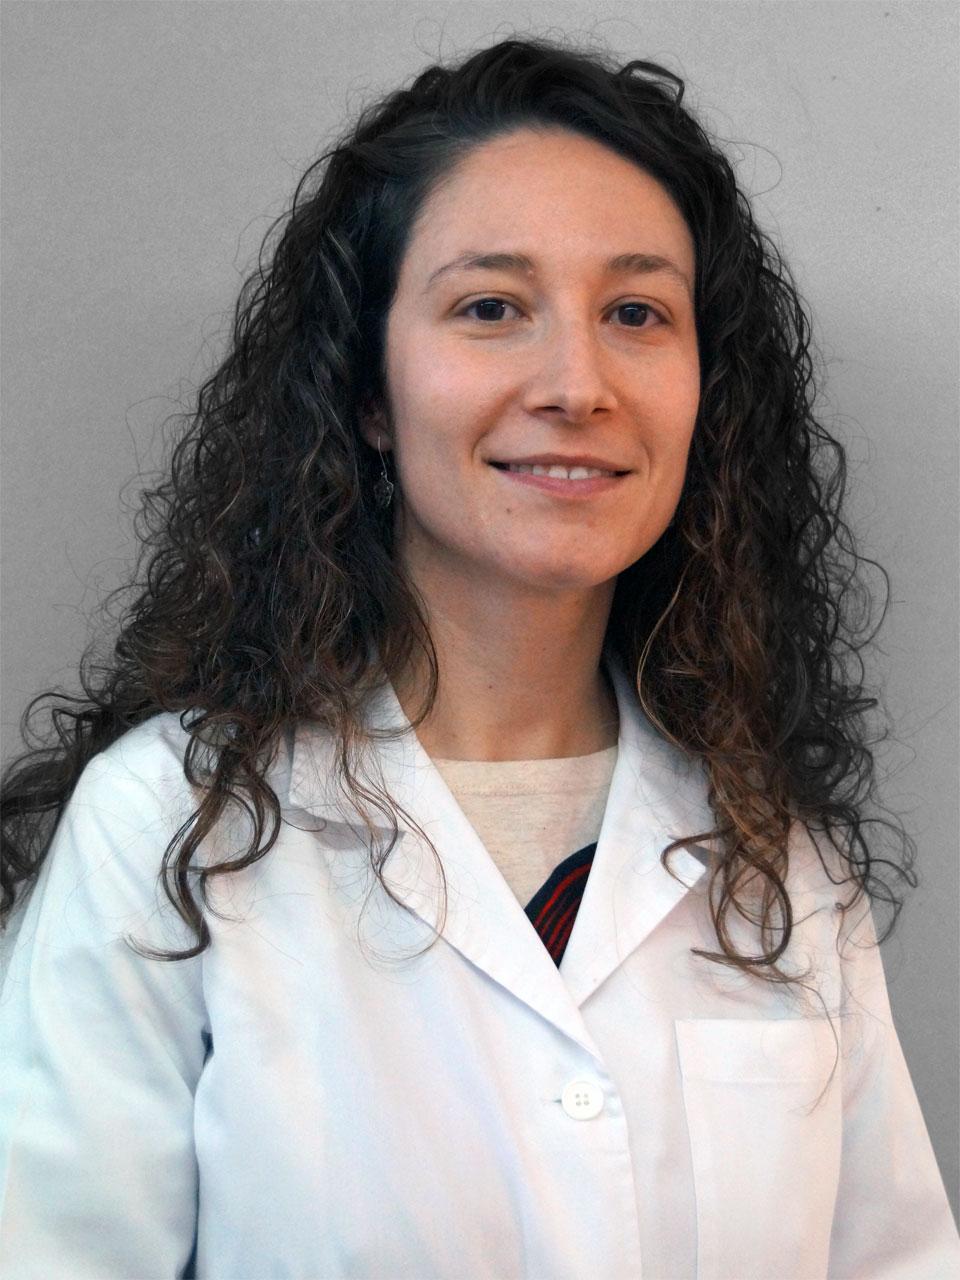 Dra. Núria Campa Falcón